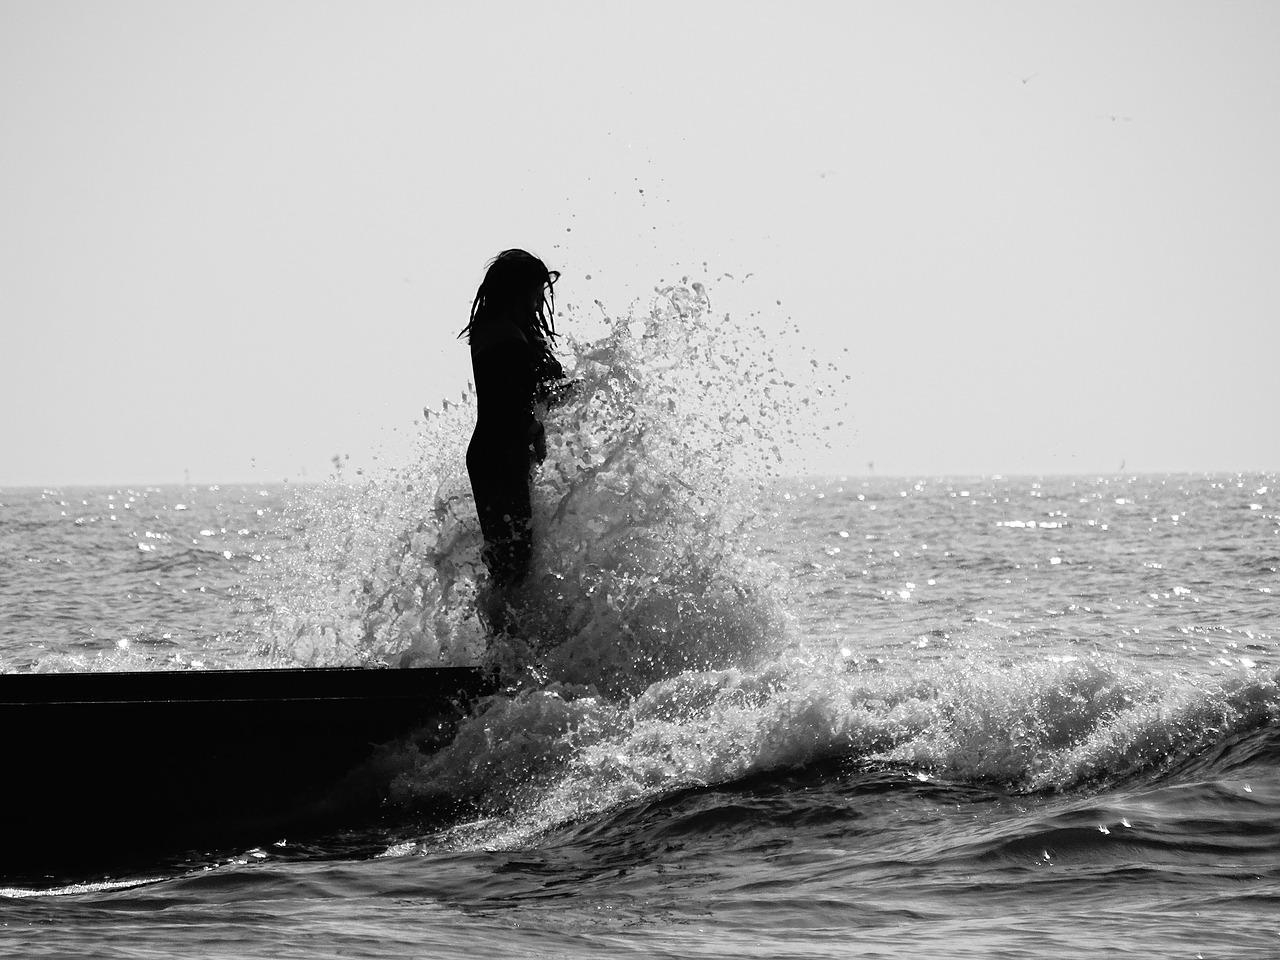 Gelombang Pantai Hitam Gambar Gratis Di Pixabay